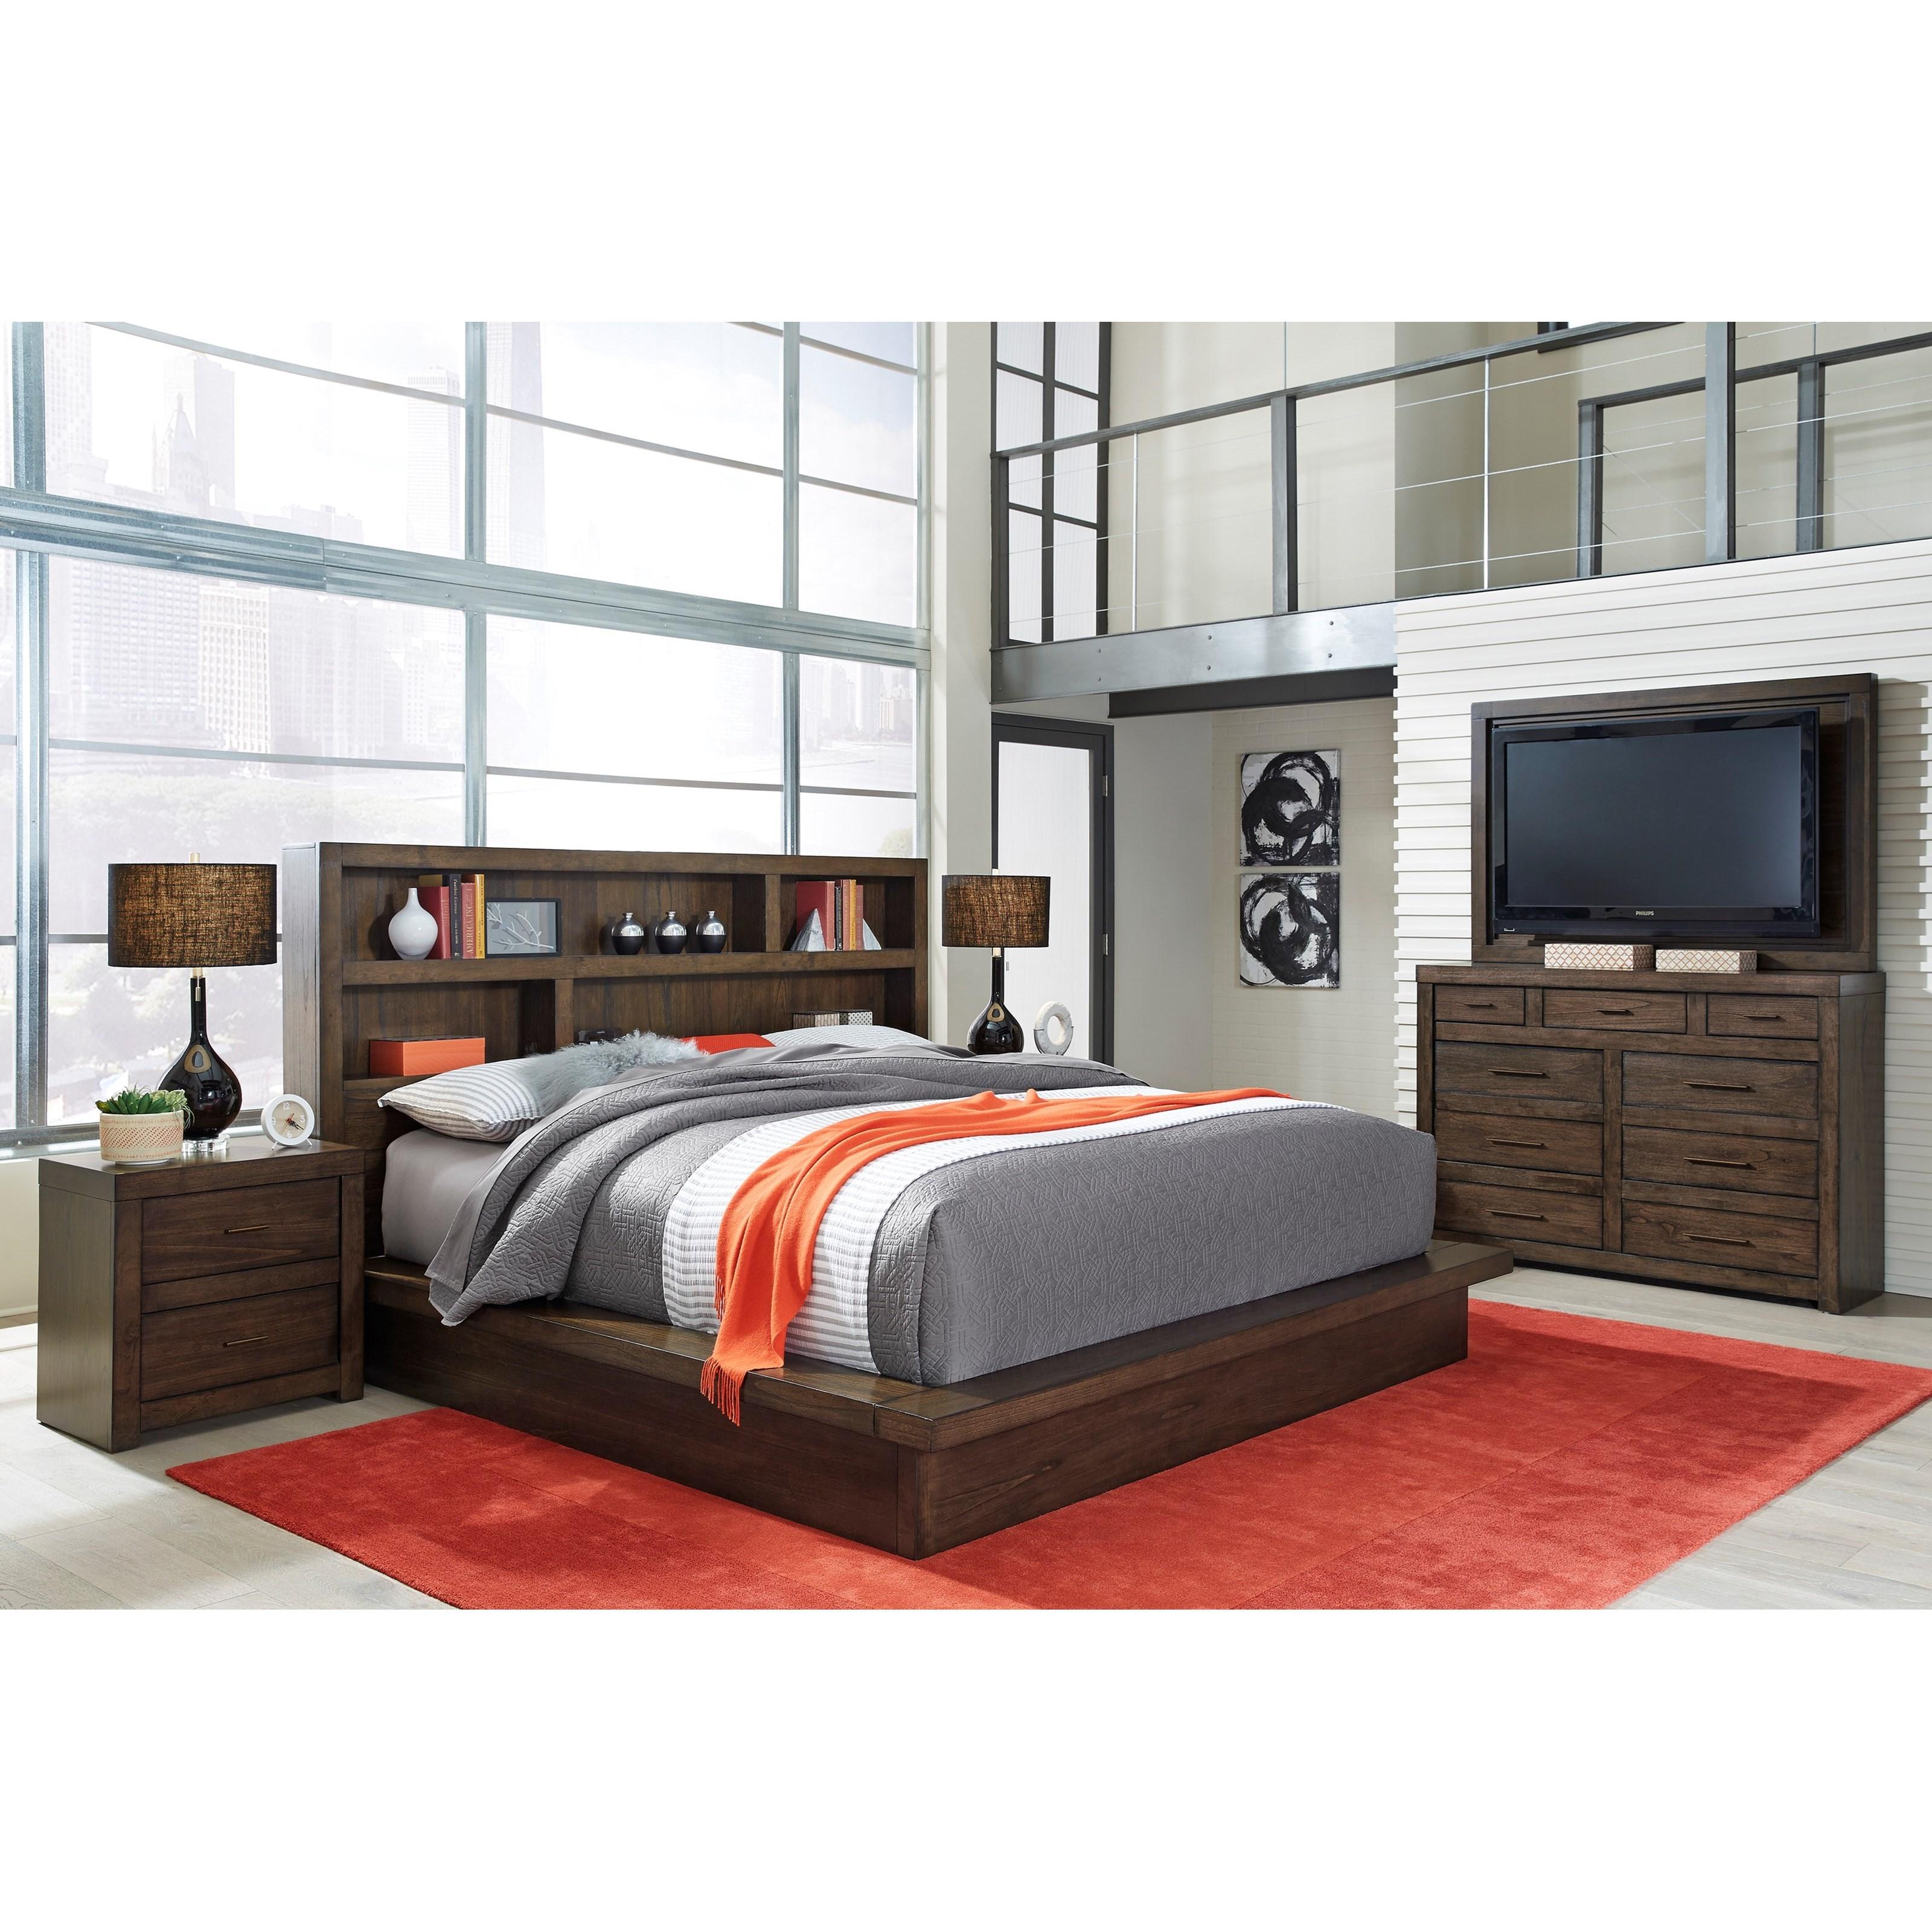 Modern Loft Queen Bedroom Group by Aspenhome at Walker's Furniture